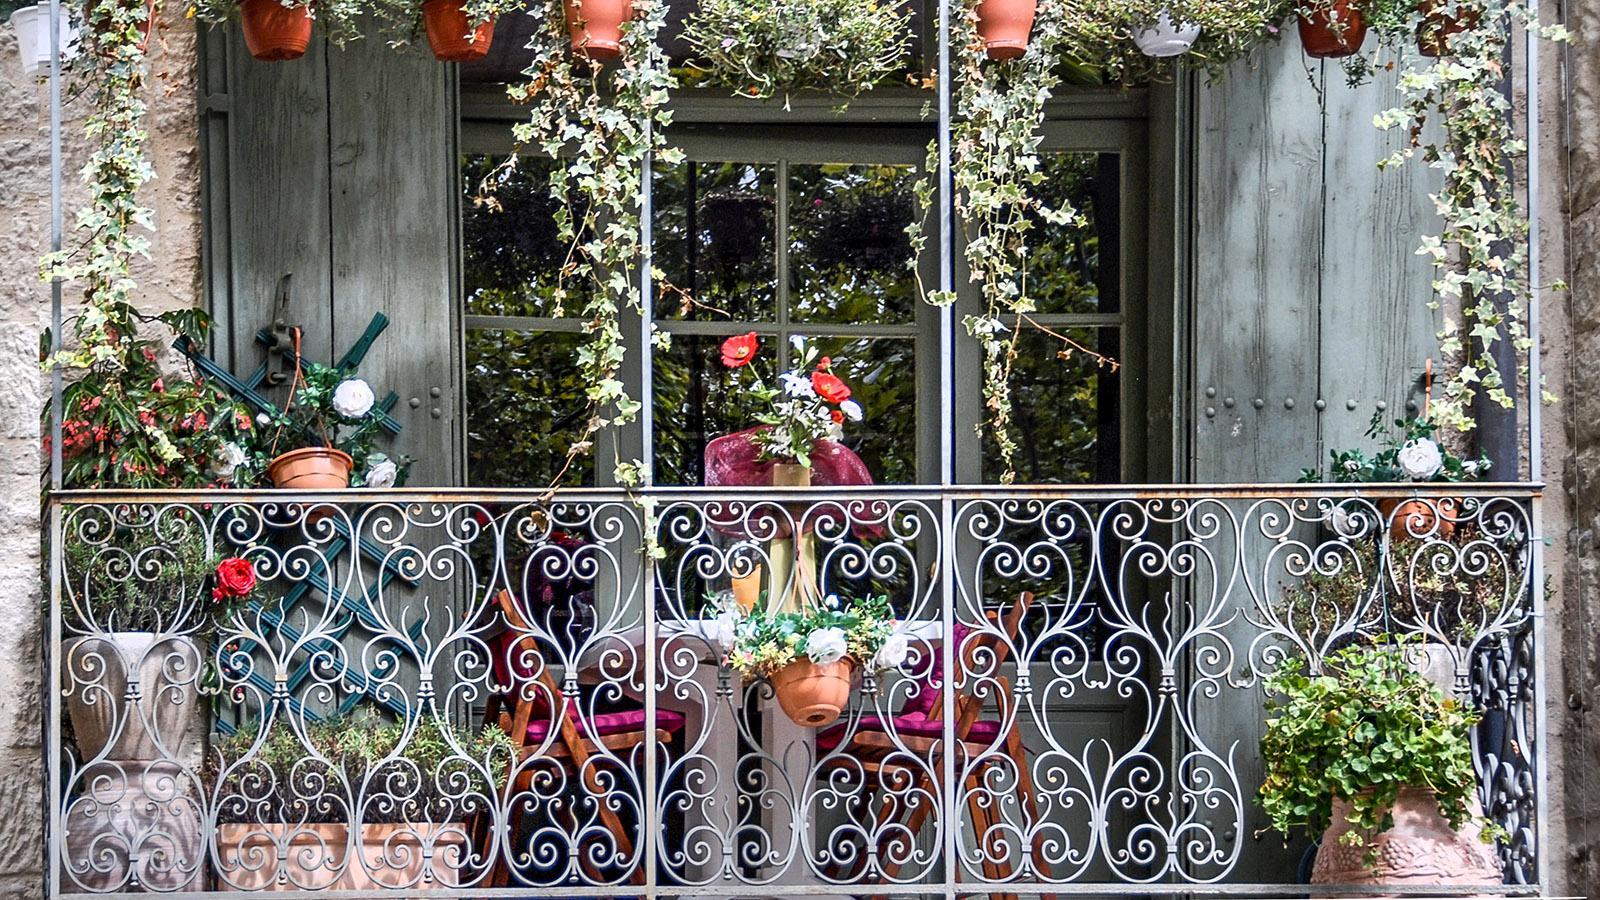 Uzès: Balkonpracht an der Place aux Herbes. Foto: Hilke Maunder